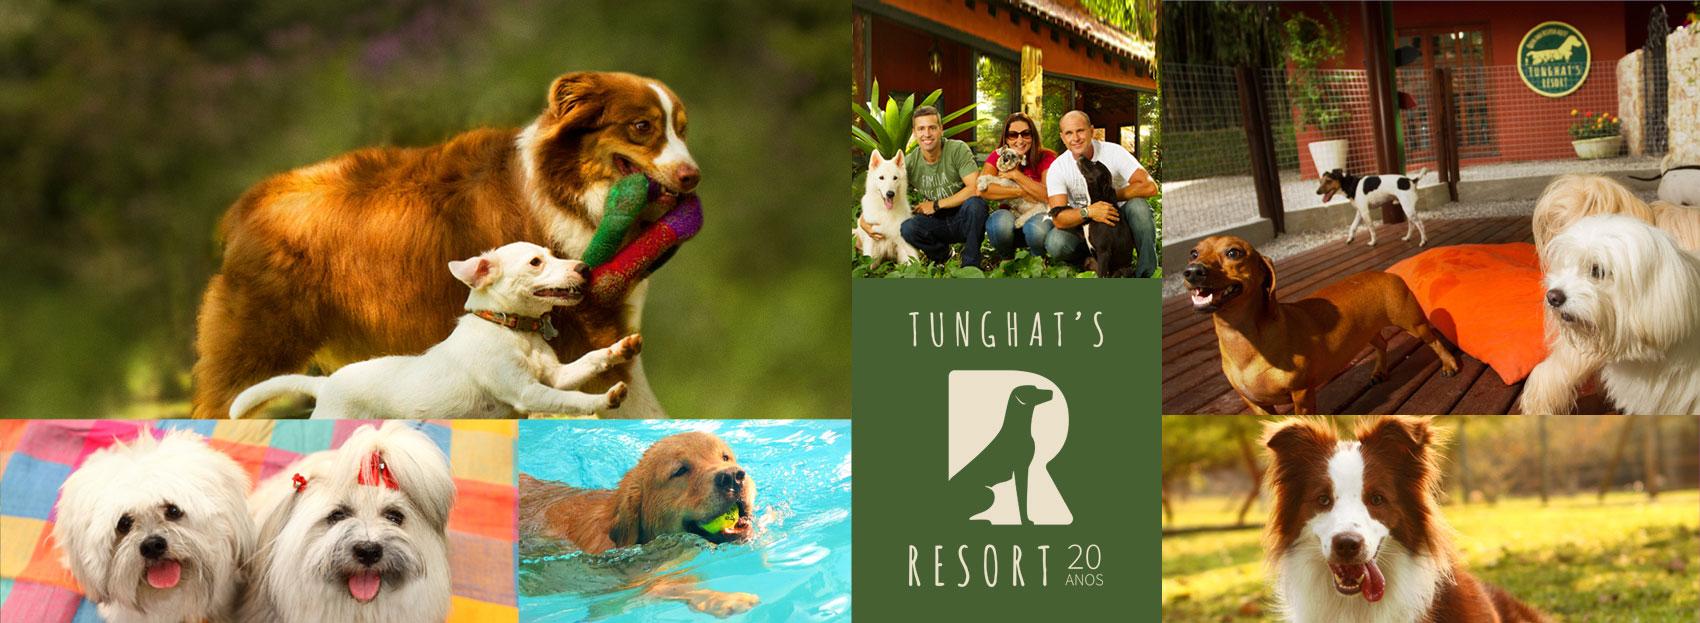 Tunghat's Resort: 20 Anos.